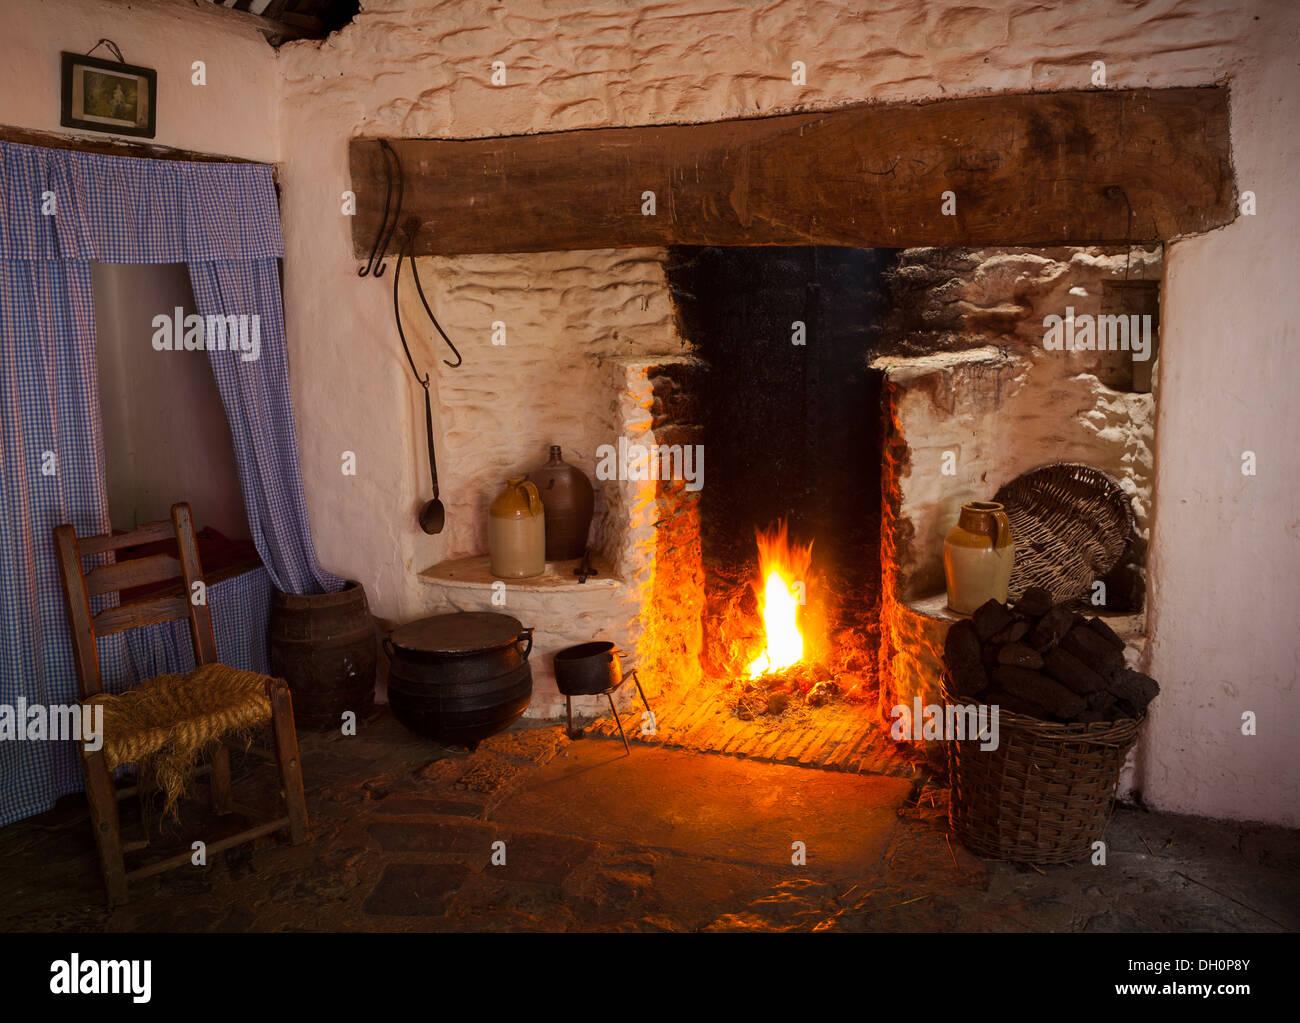 Peat Ireland Stock Photos & Peat Ireland Stock Images - Alamy